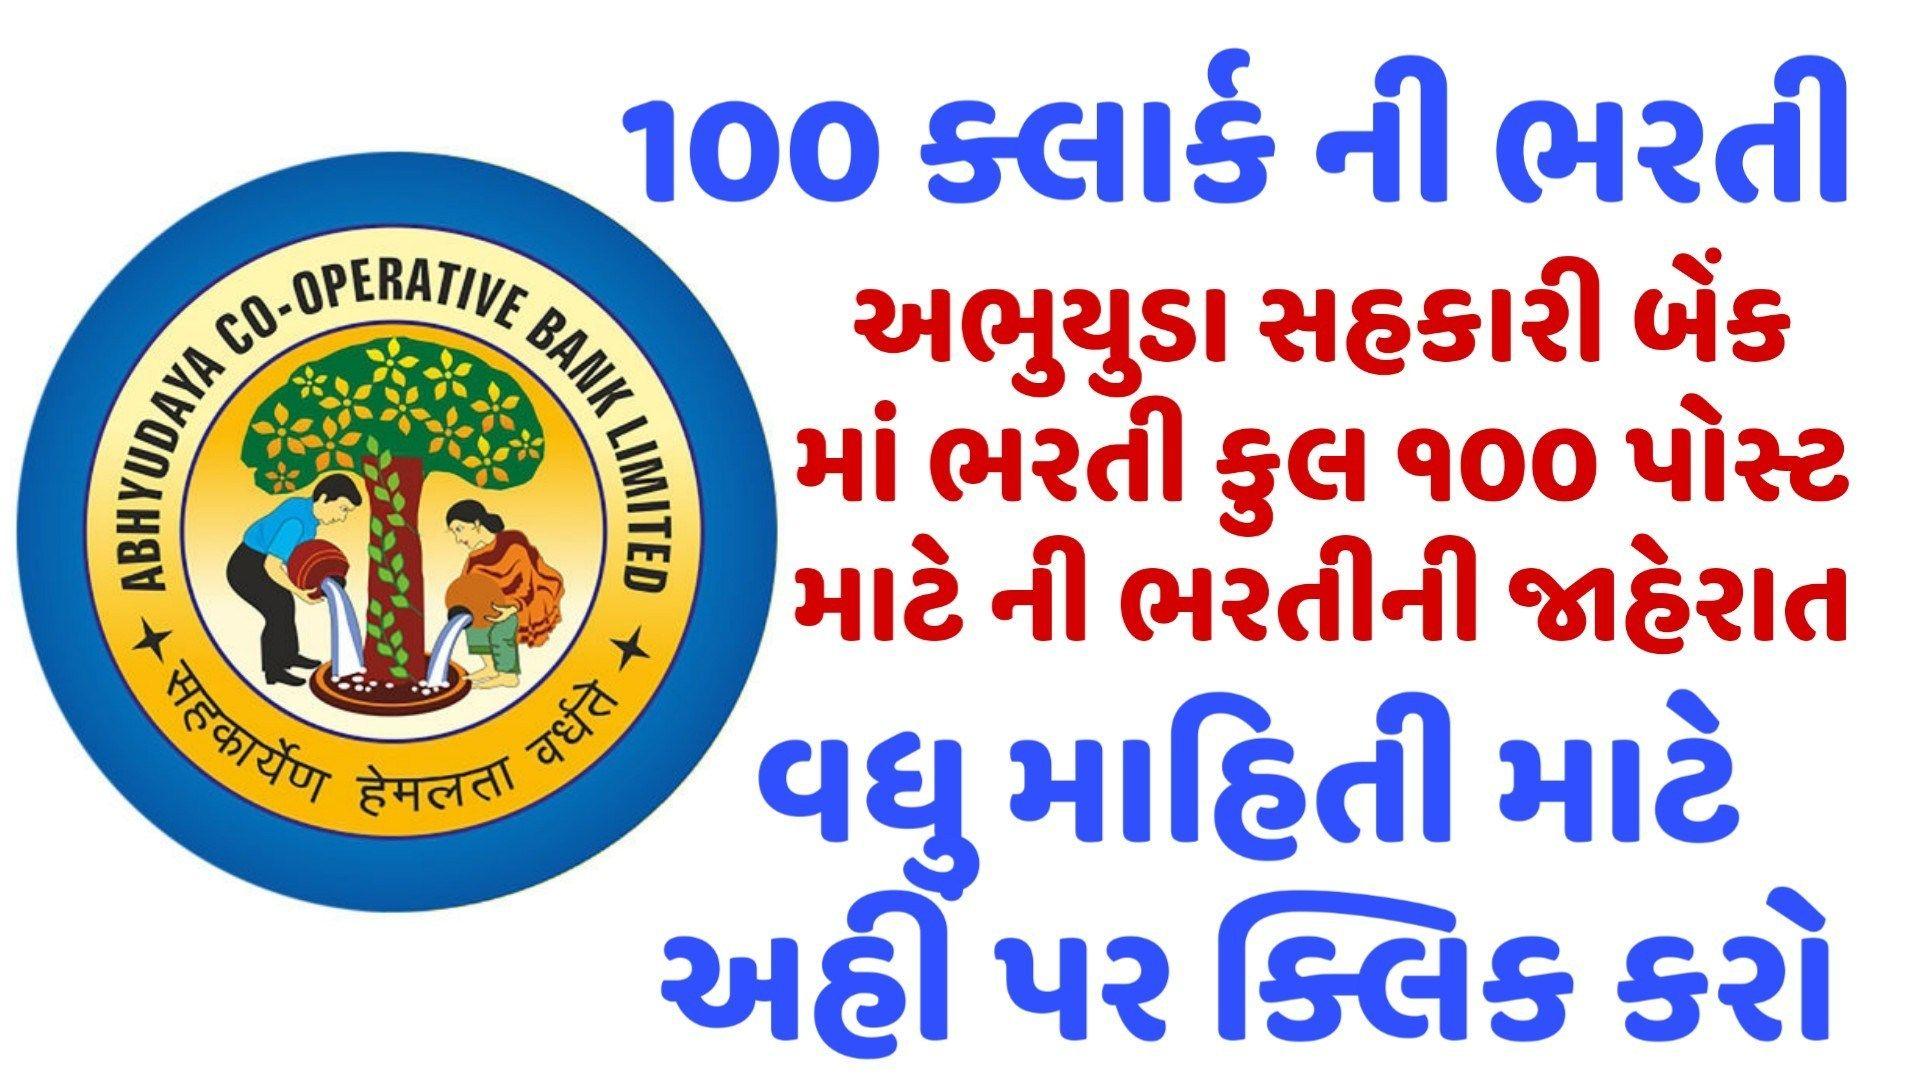 Abhyudaya cooperative bank recruitment for 100 clerk